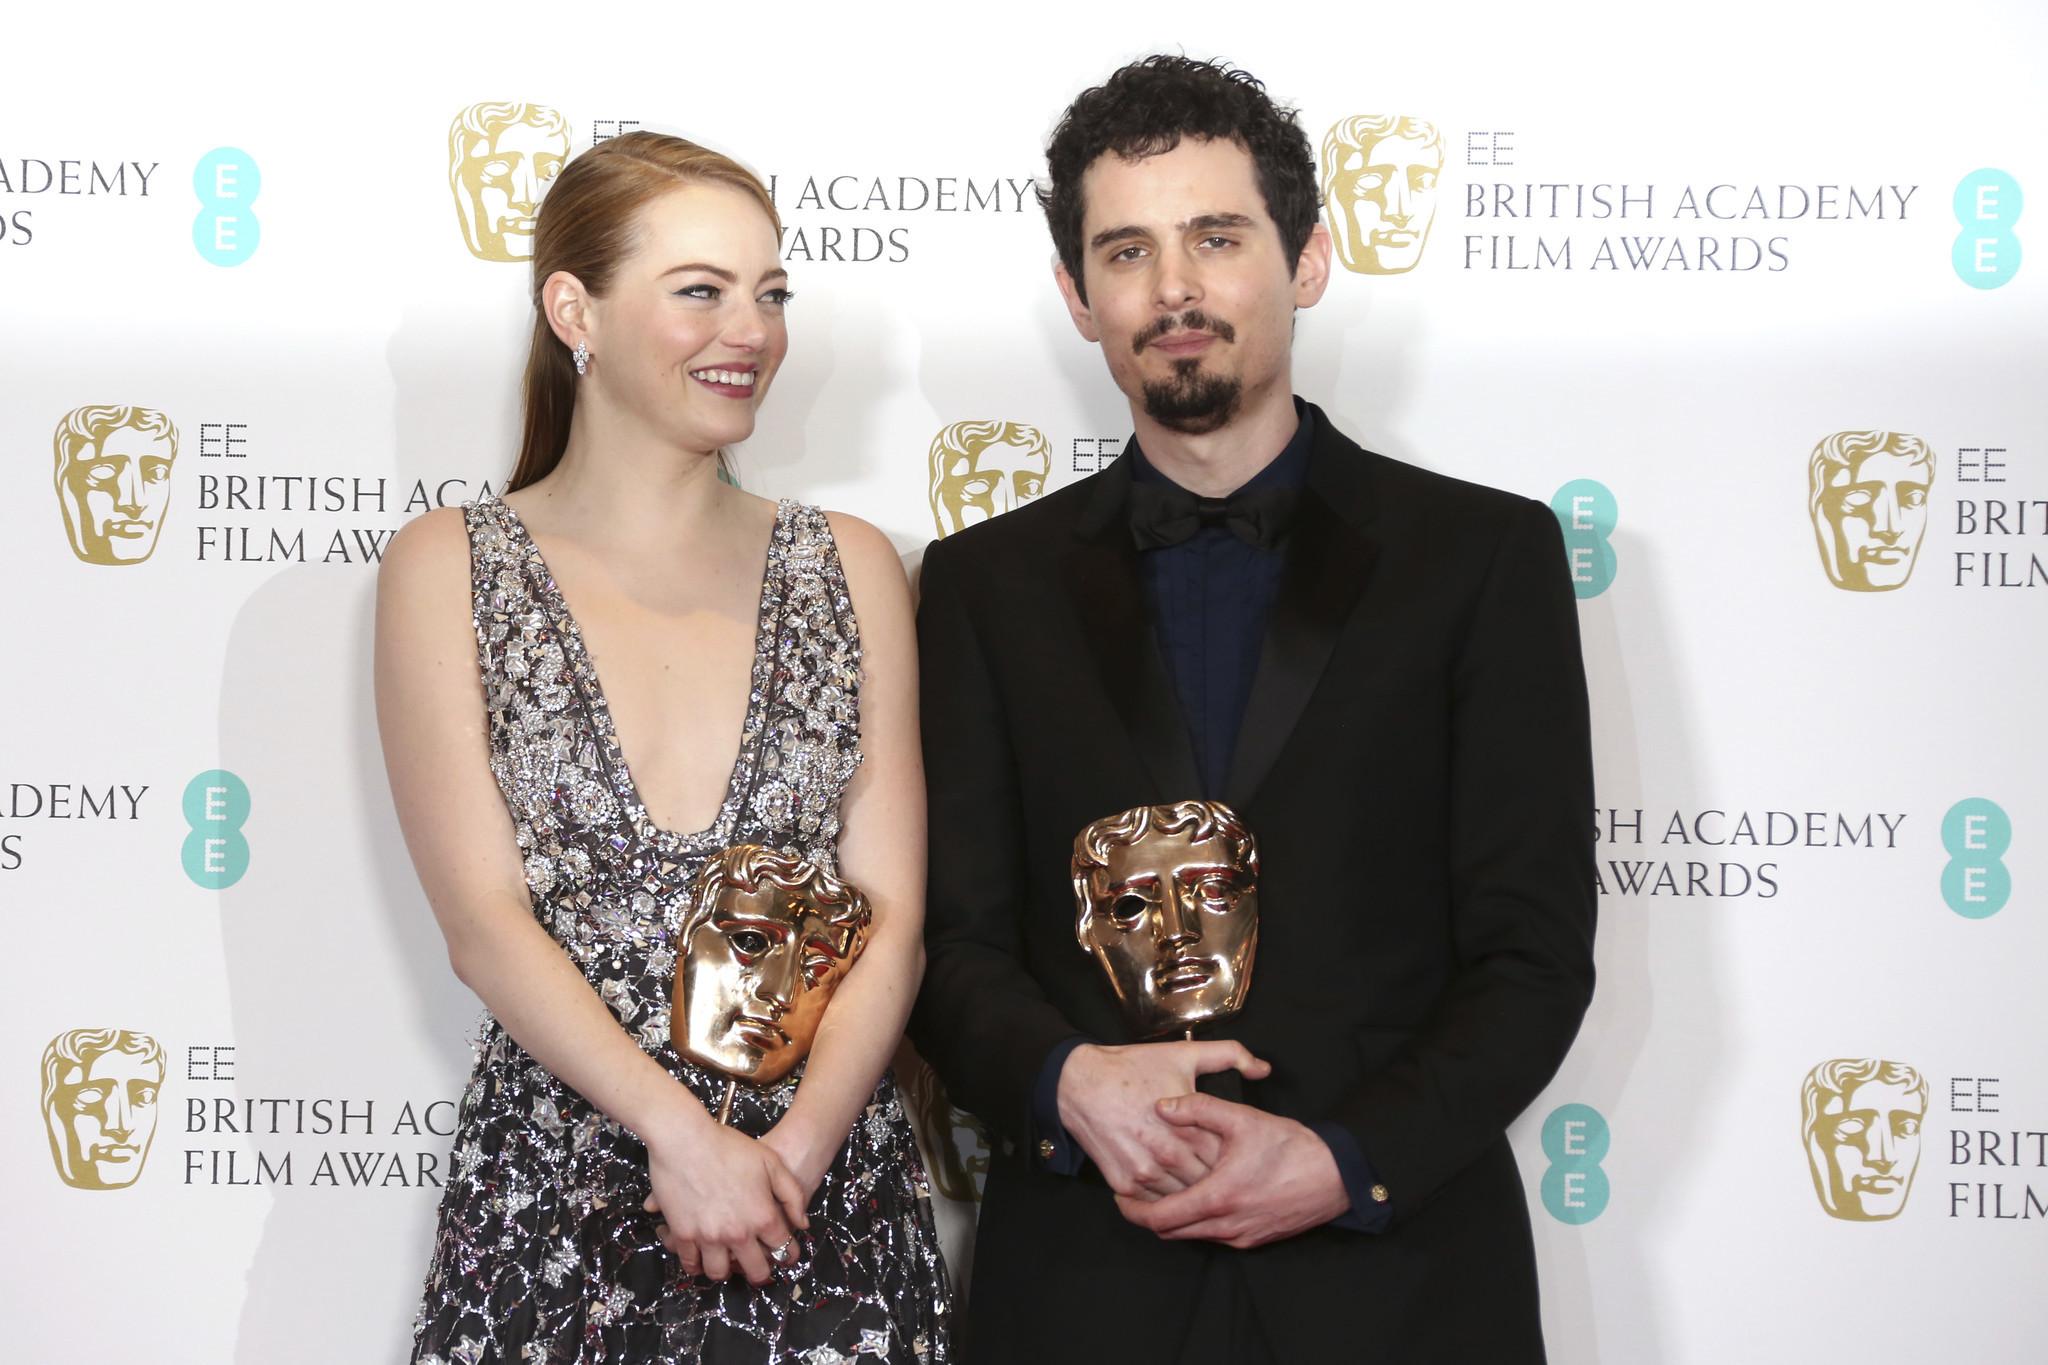 Bafta Awards: 'La La Land' Takes 5 Prizes At British Academy Awards